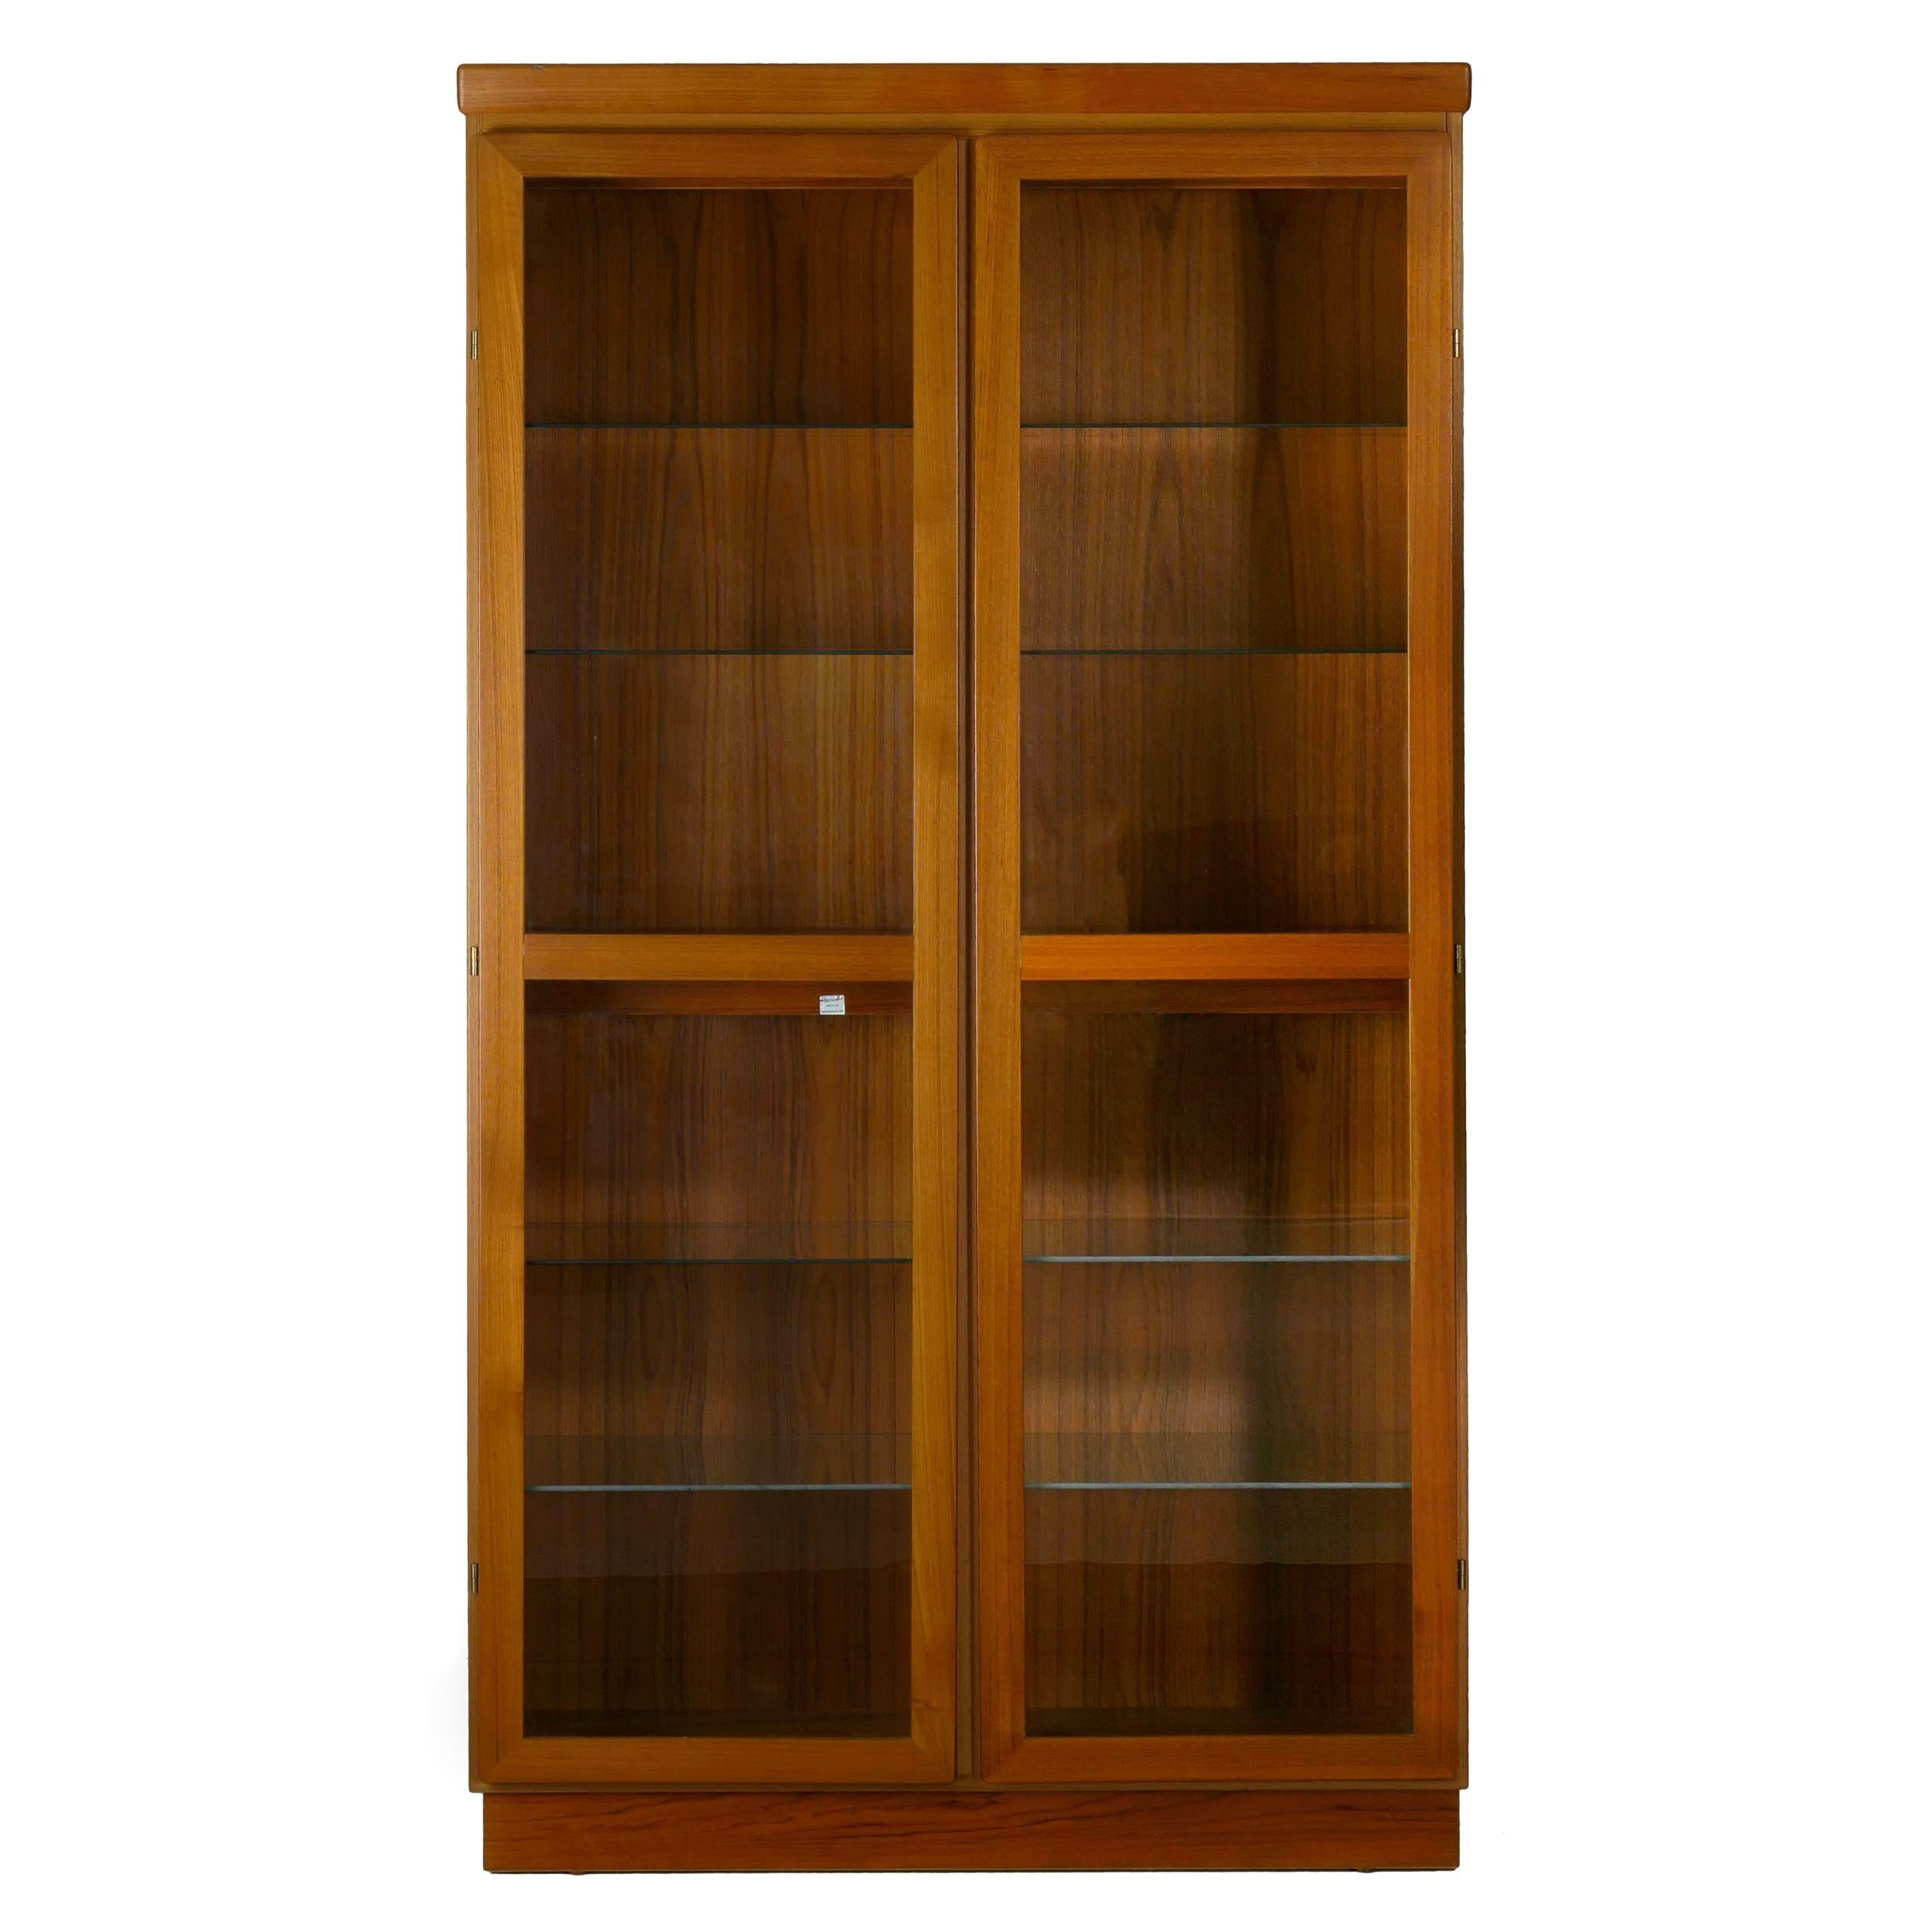 Danish Mid Century Modern Teak Display Cabinet Bookshelf By Skovby